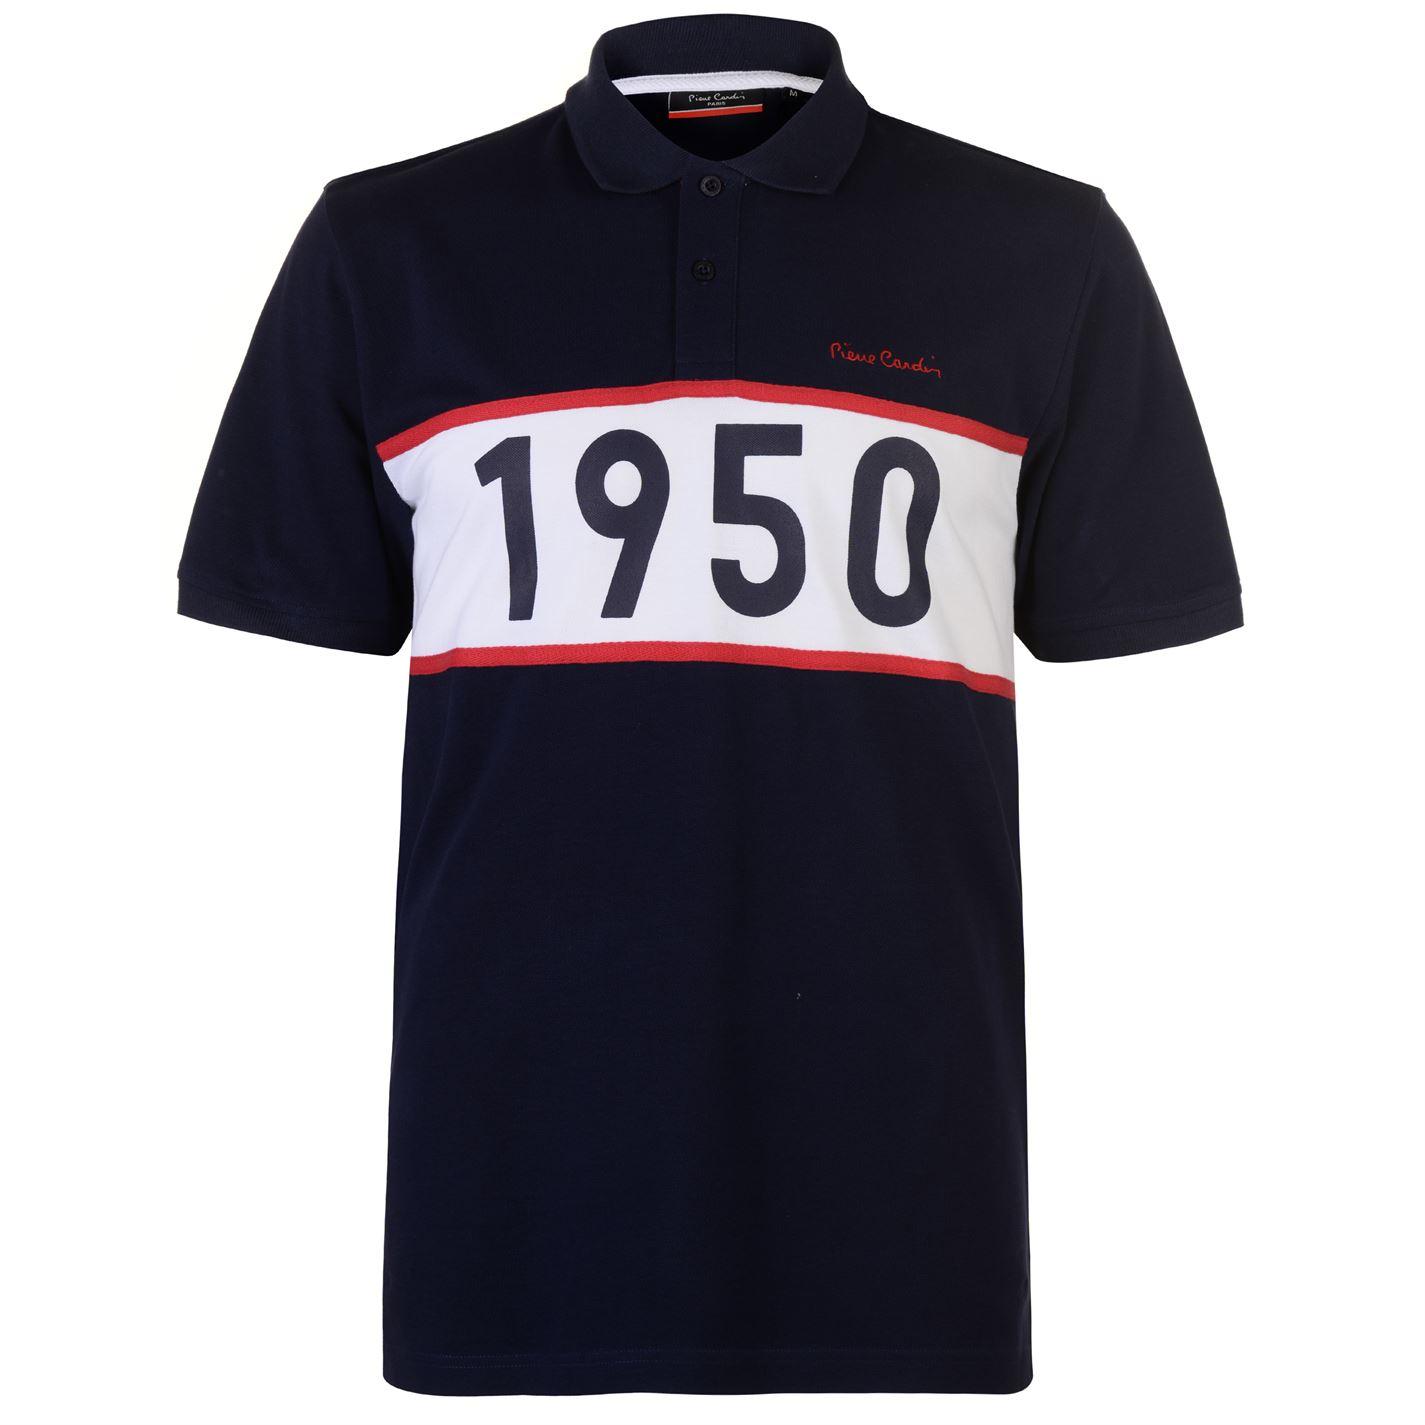 e43f3e367 ... Cardin 1950 Polo Shirt Mens Navy. -8%. Pierre ...